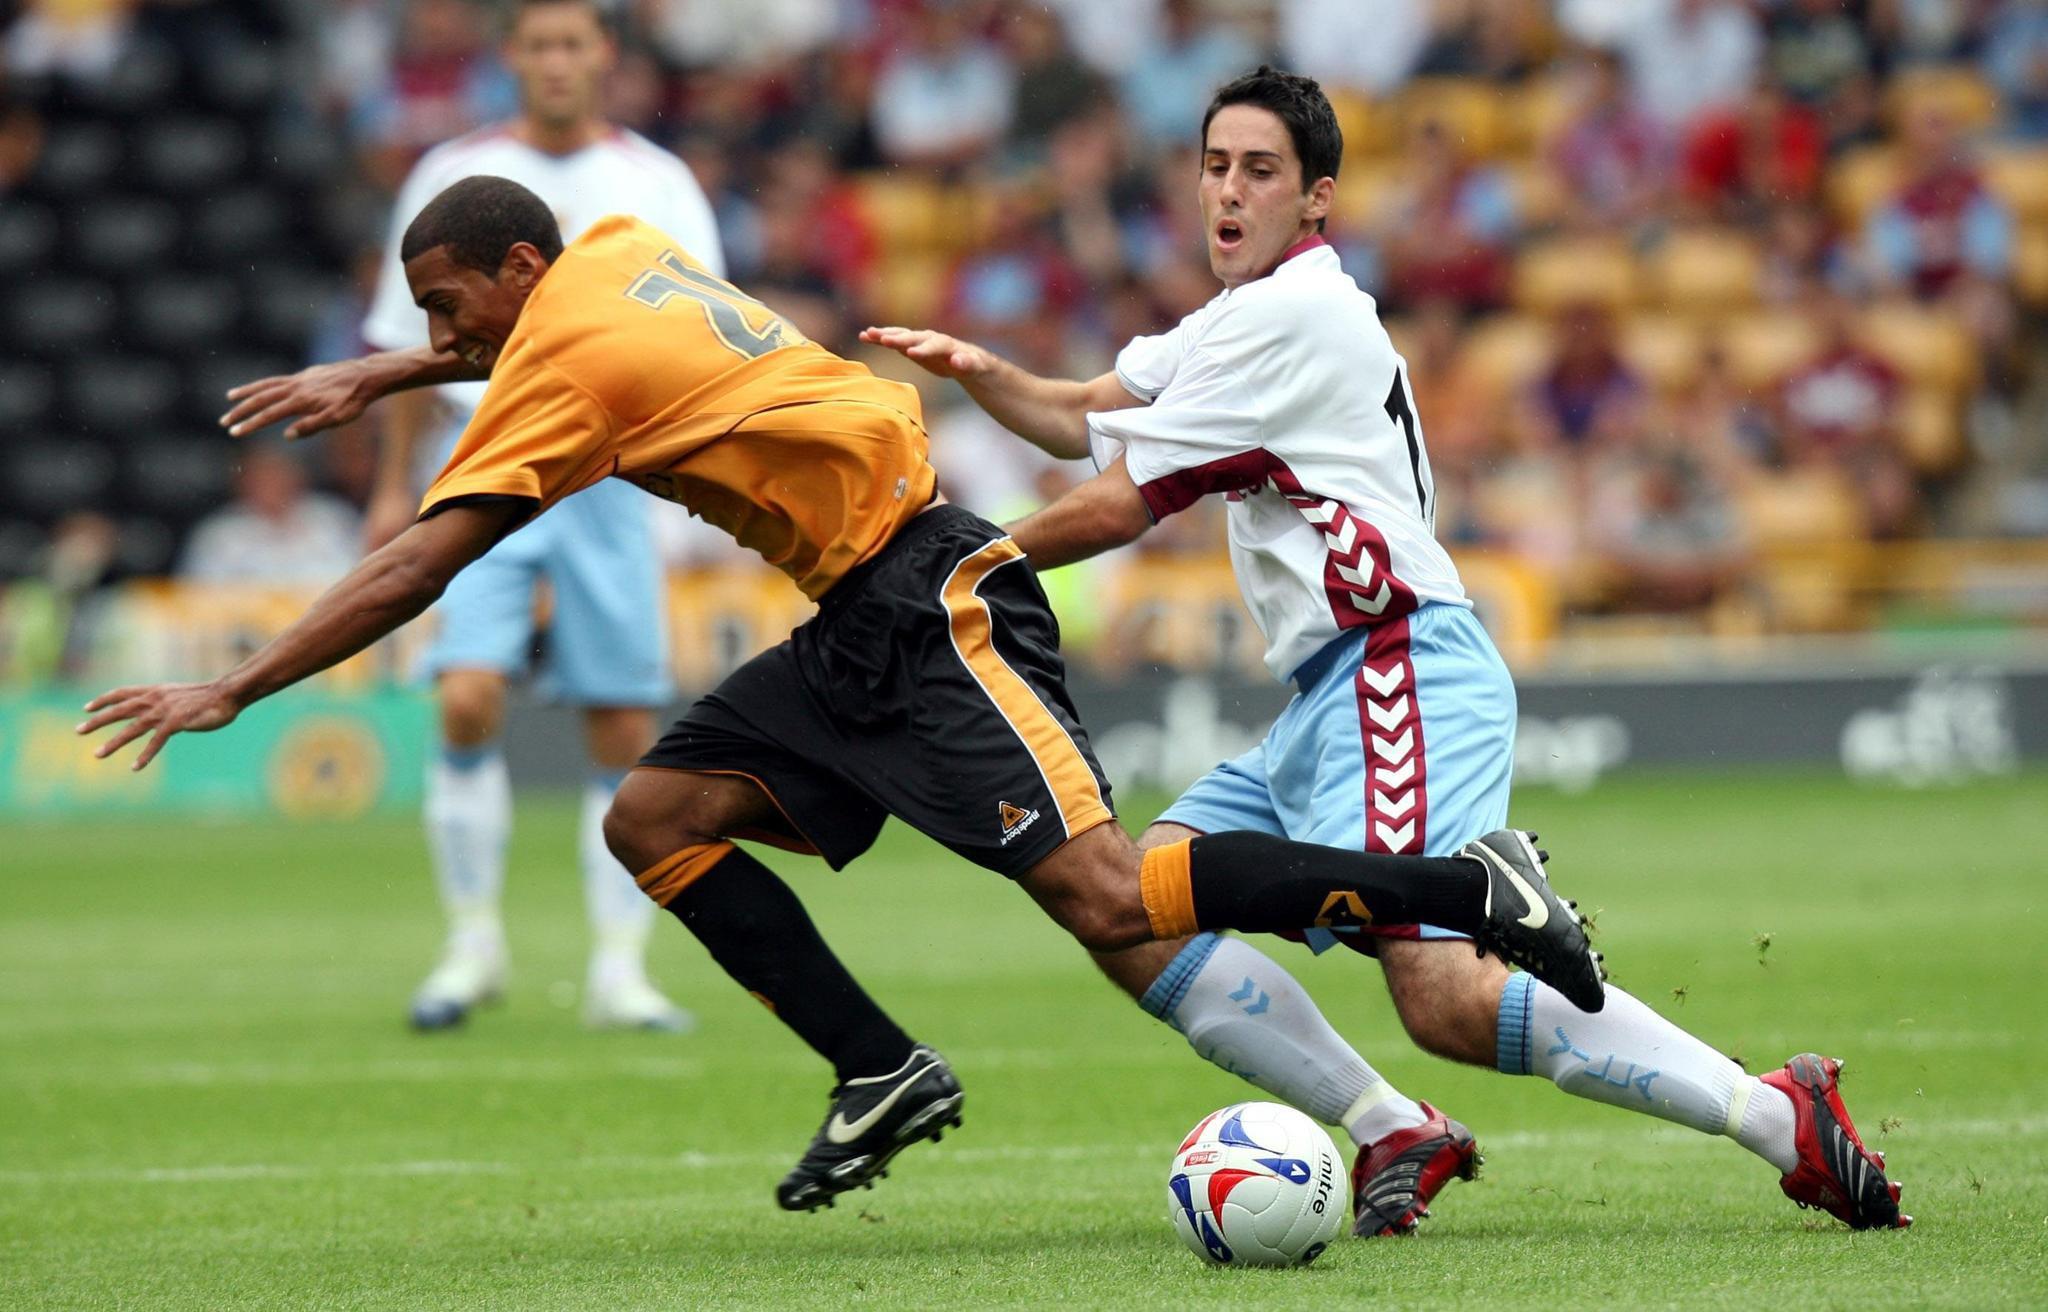 Soccer - pre-season friendly - Wolverhampton v Aston Villa - Molineux, Wolverhampton.